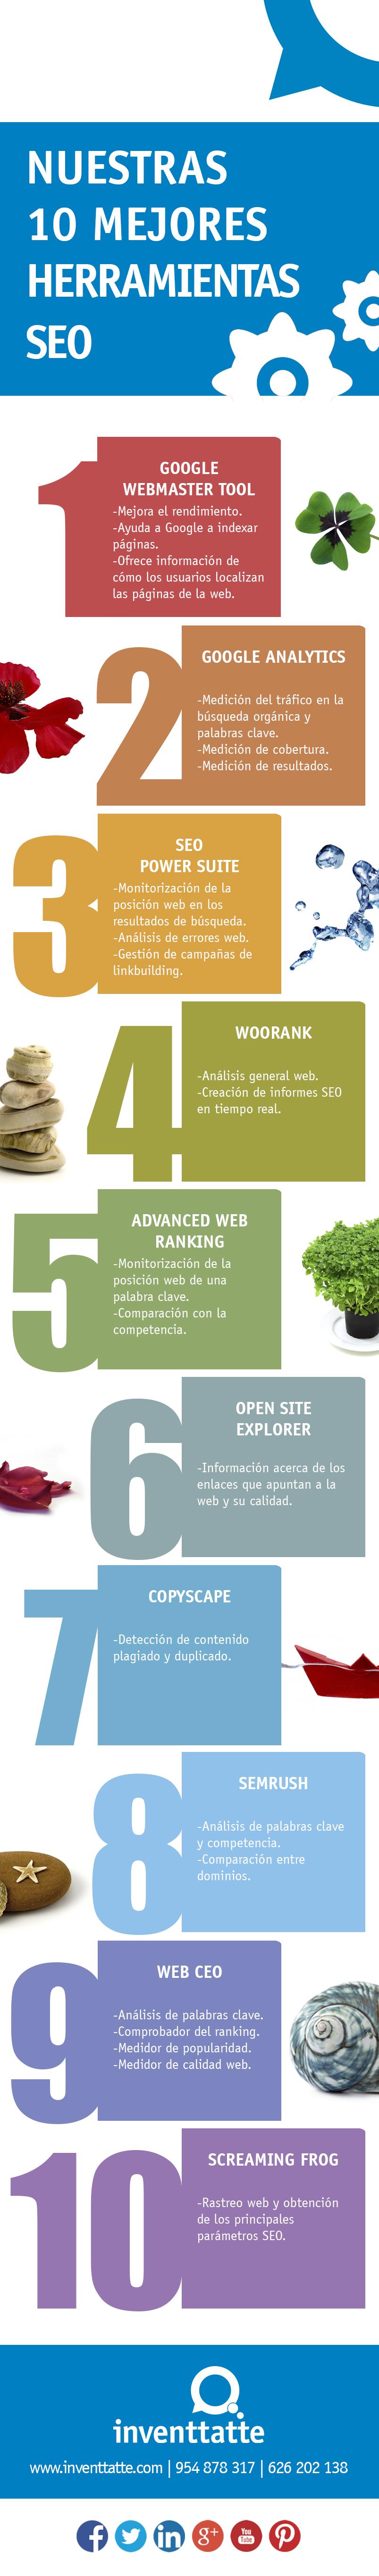 10 herramientas SEO imprescindibles